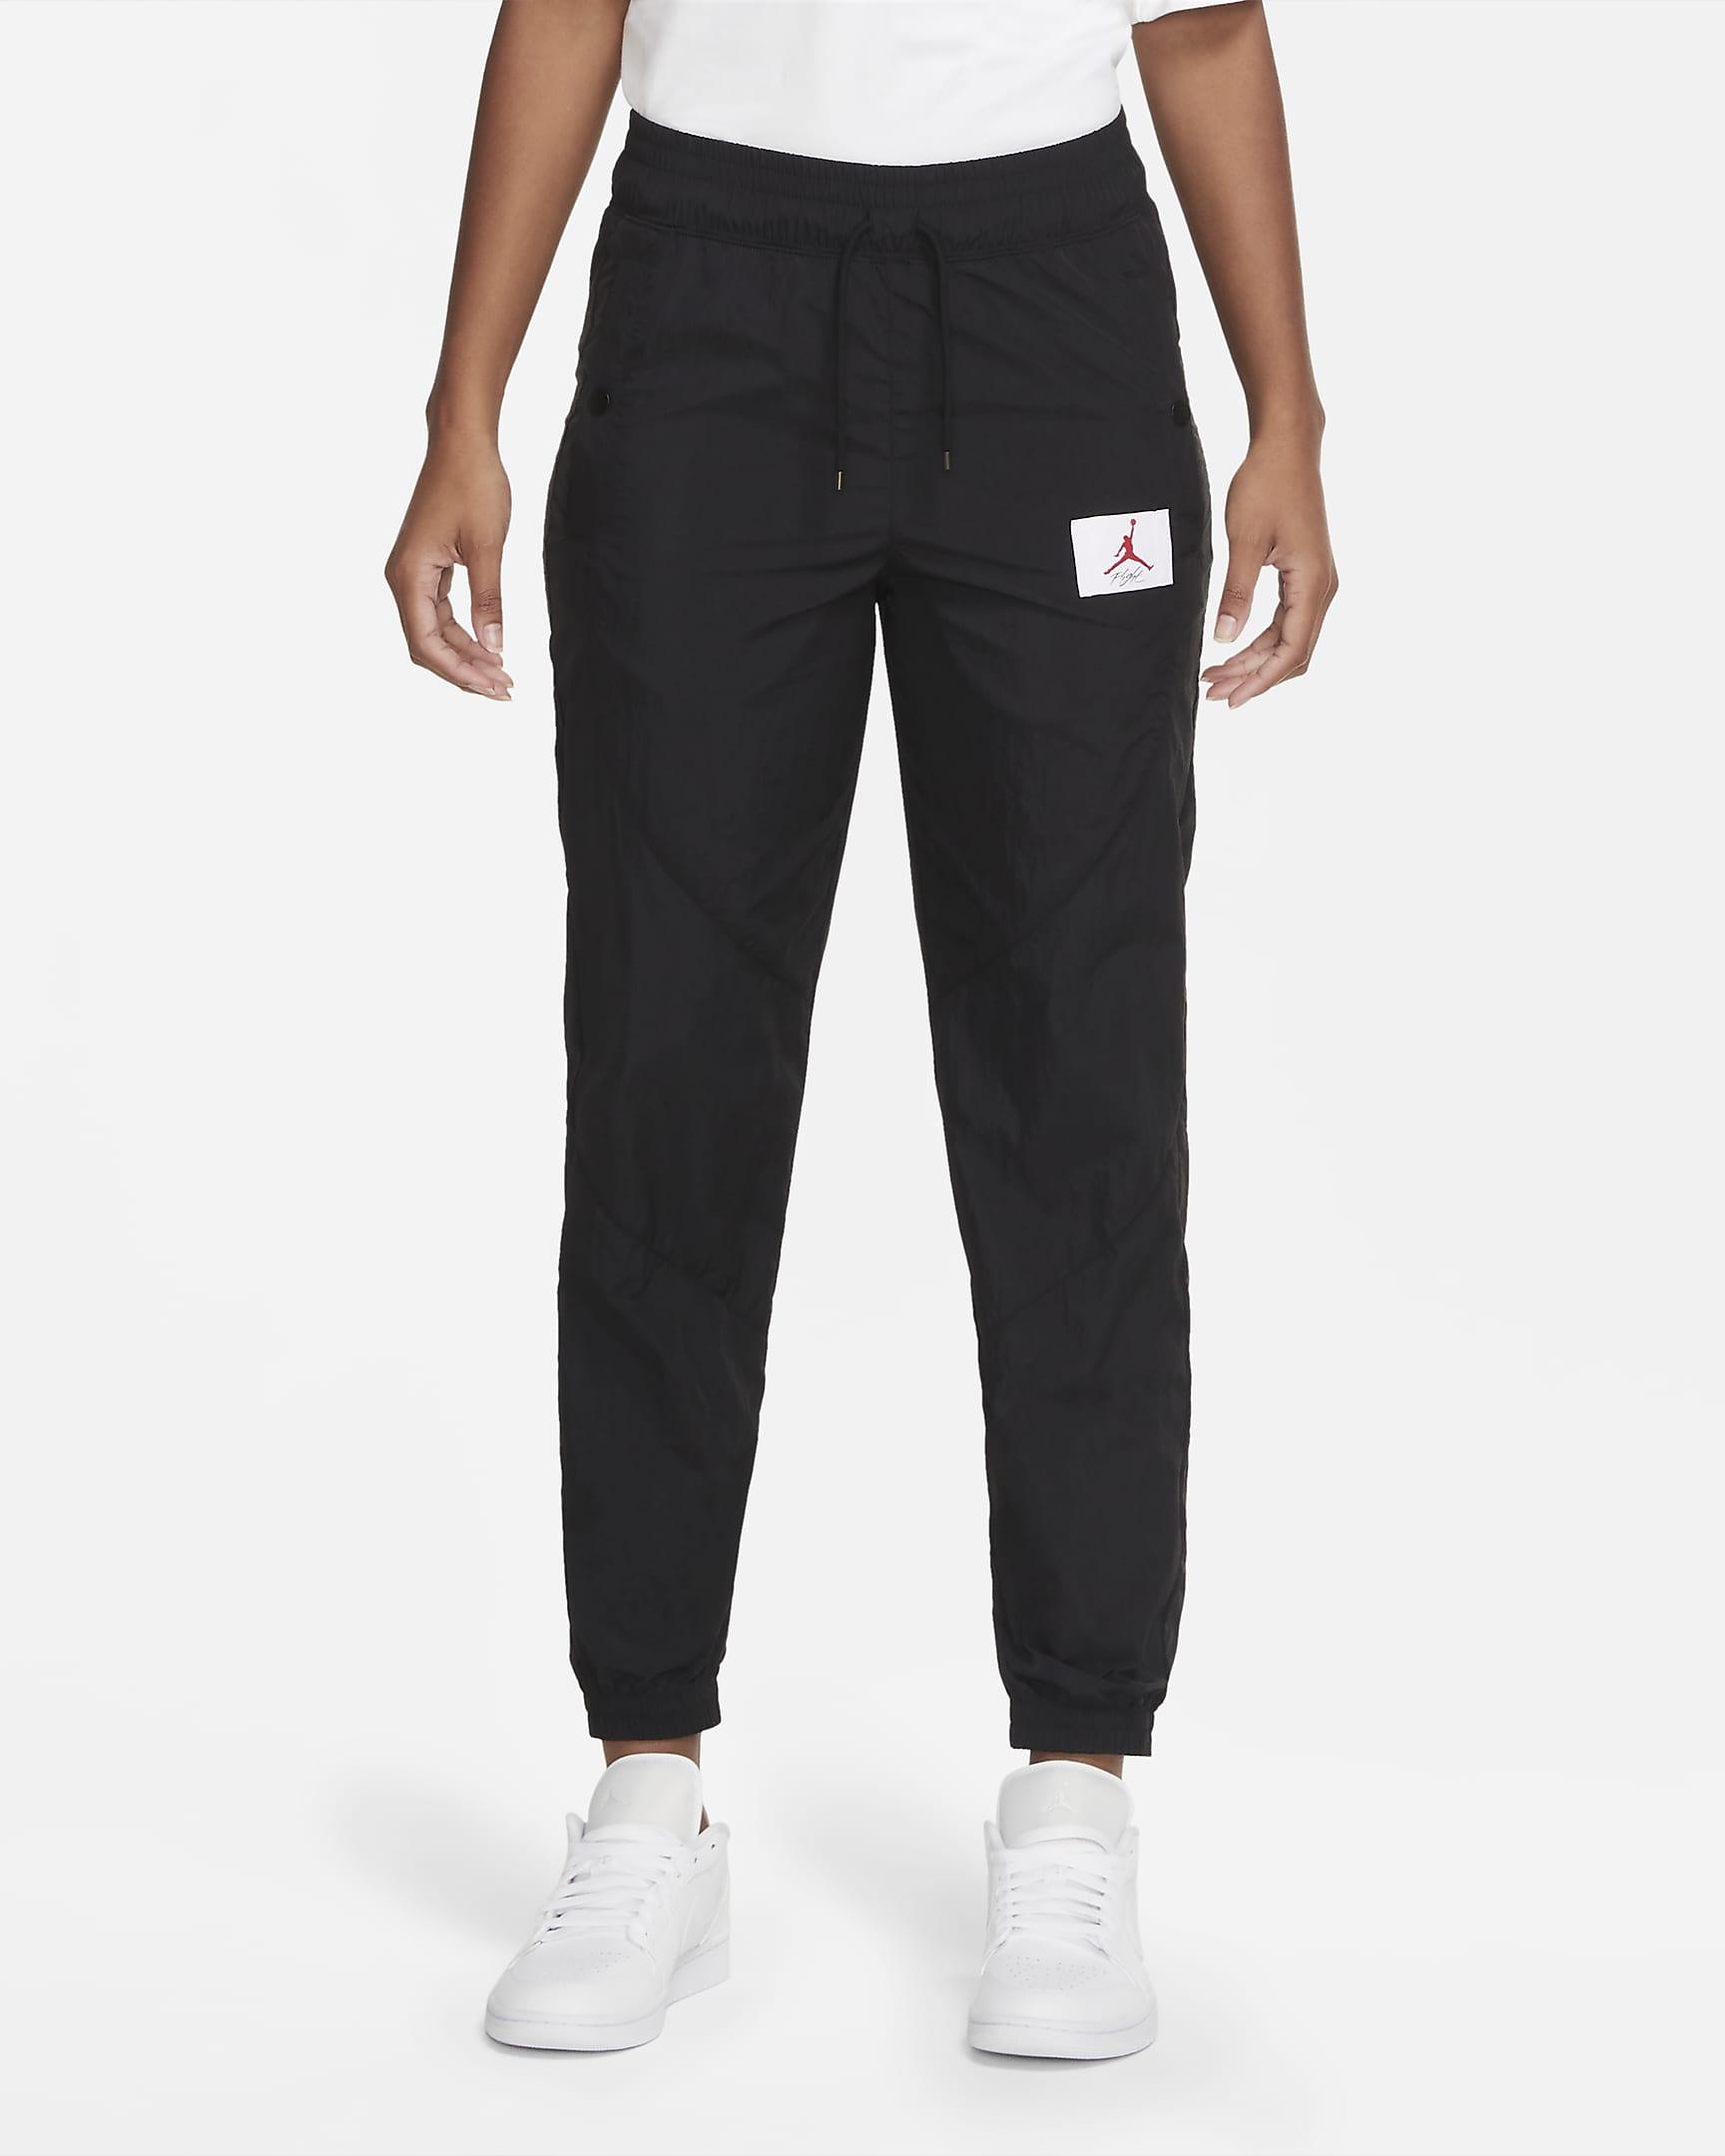 jordan-womens-woven-pants-LV06NR-1